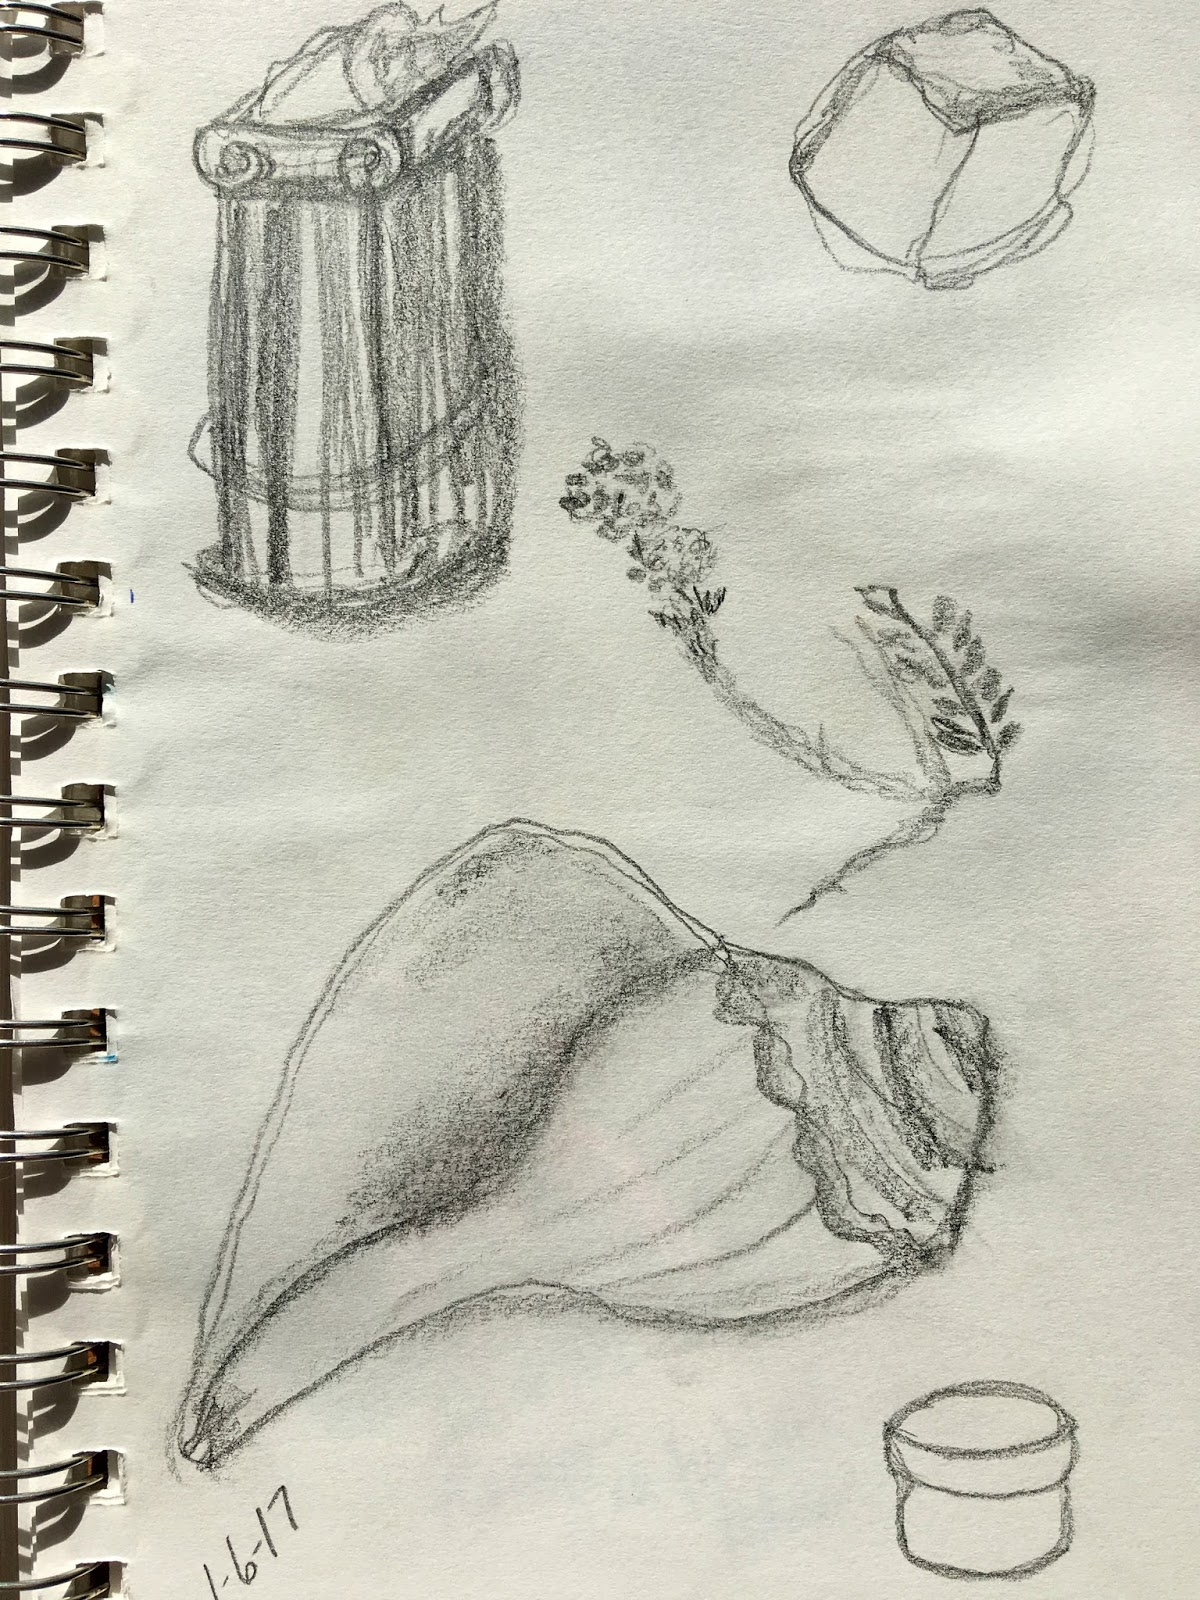 sketchygirlz